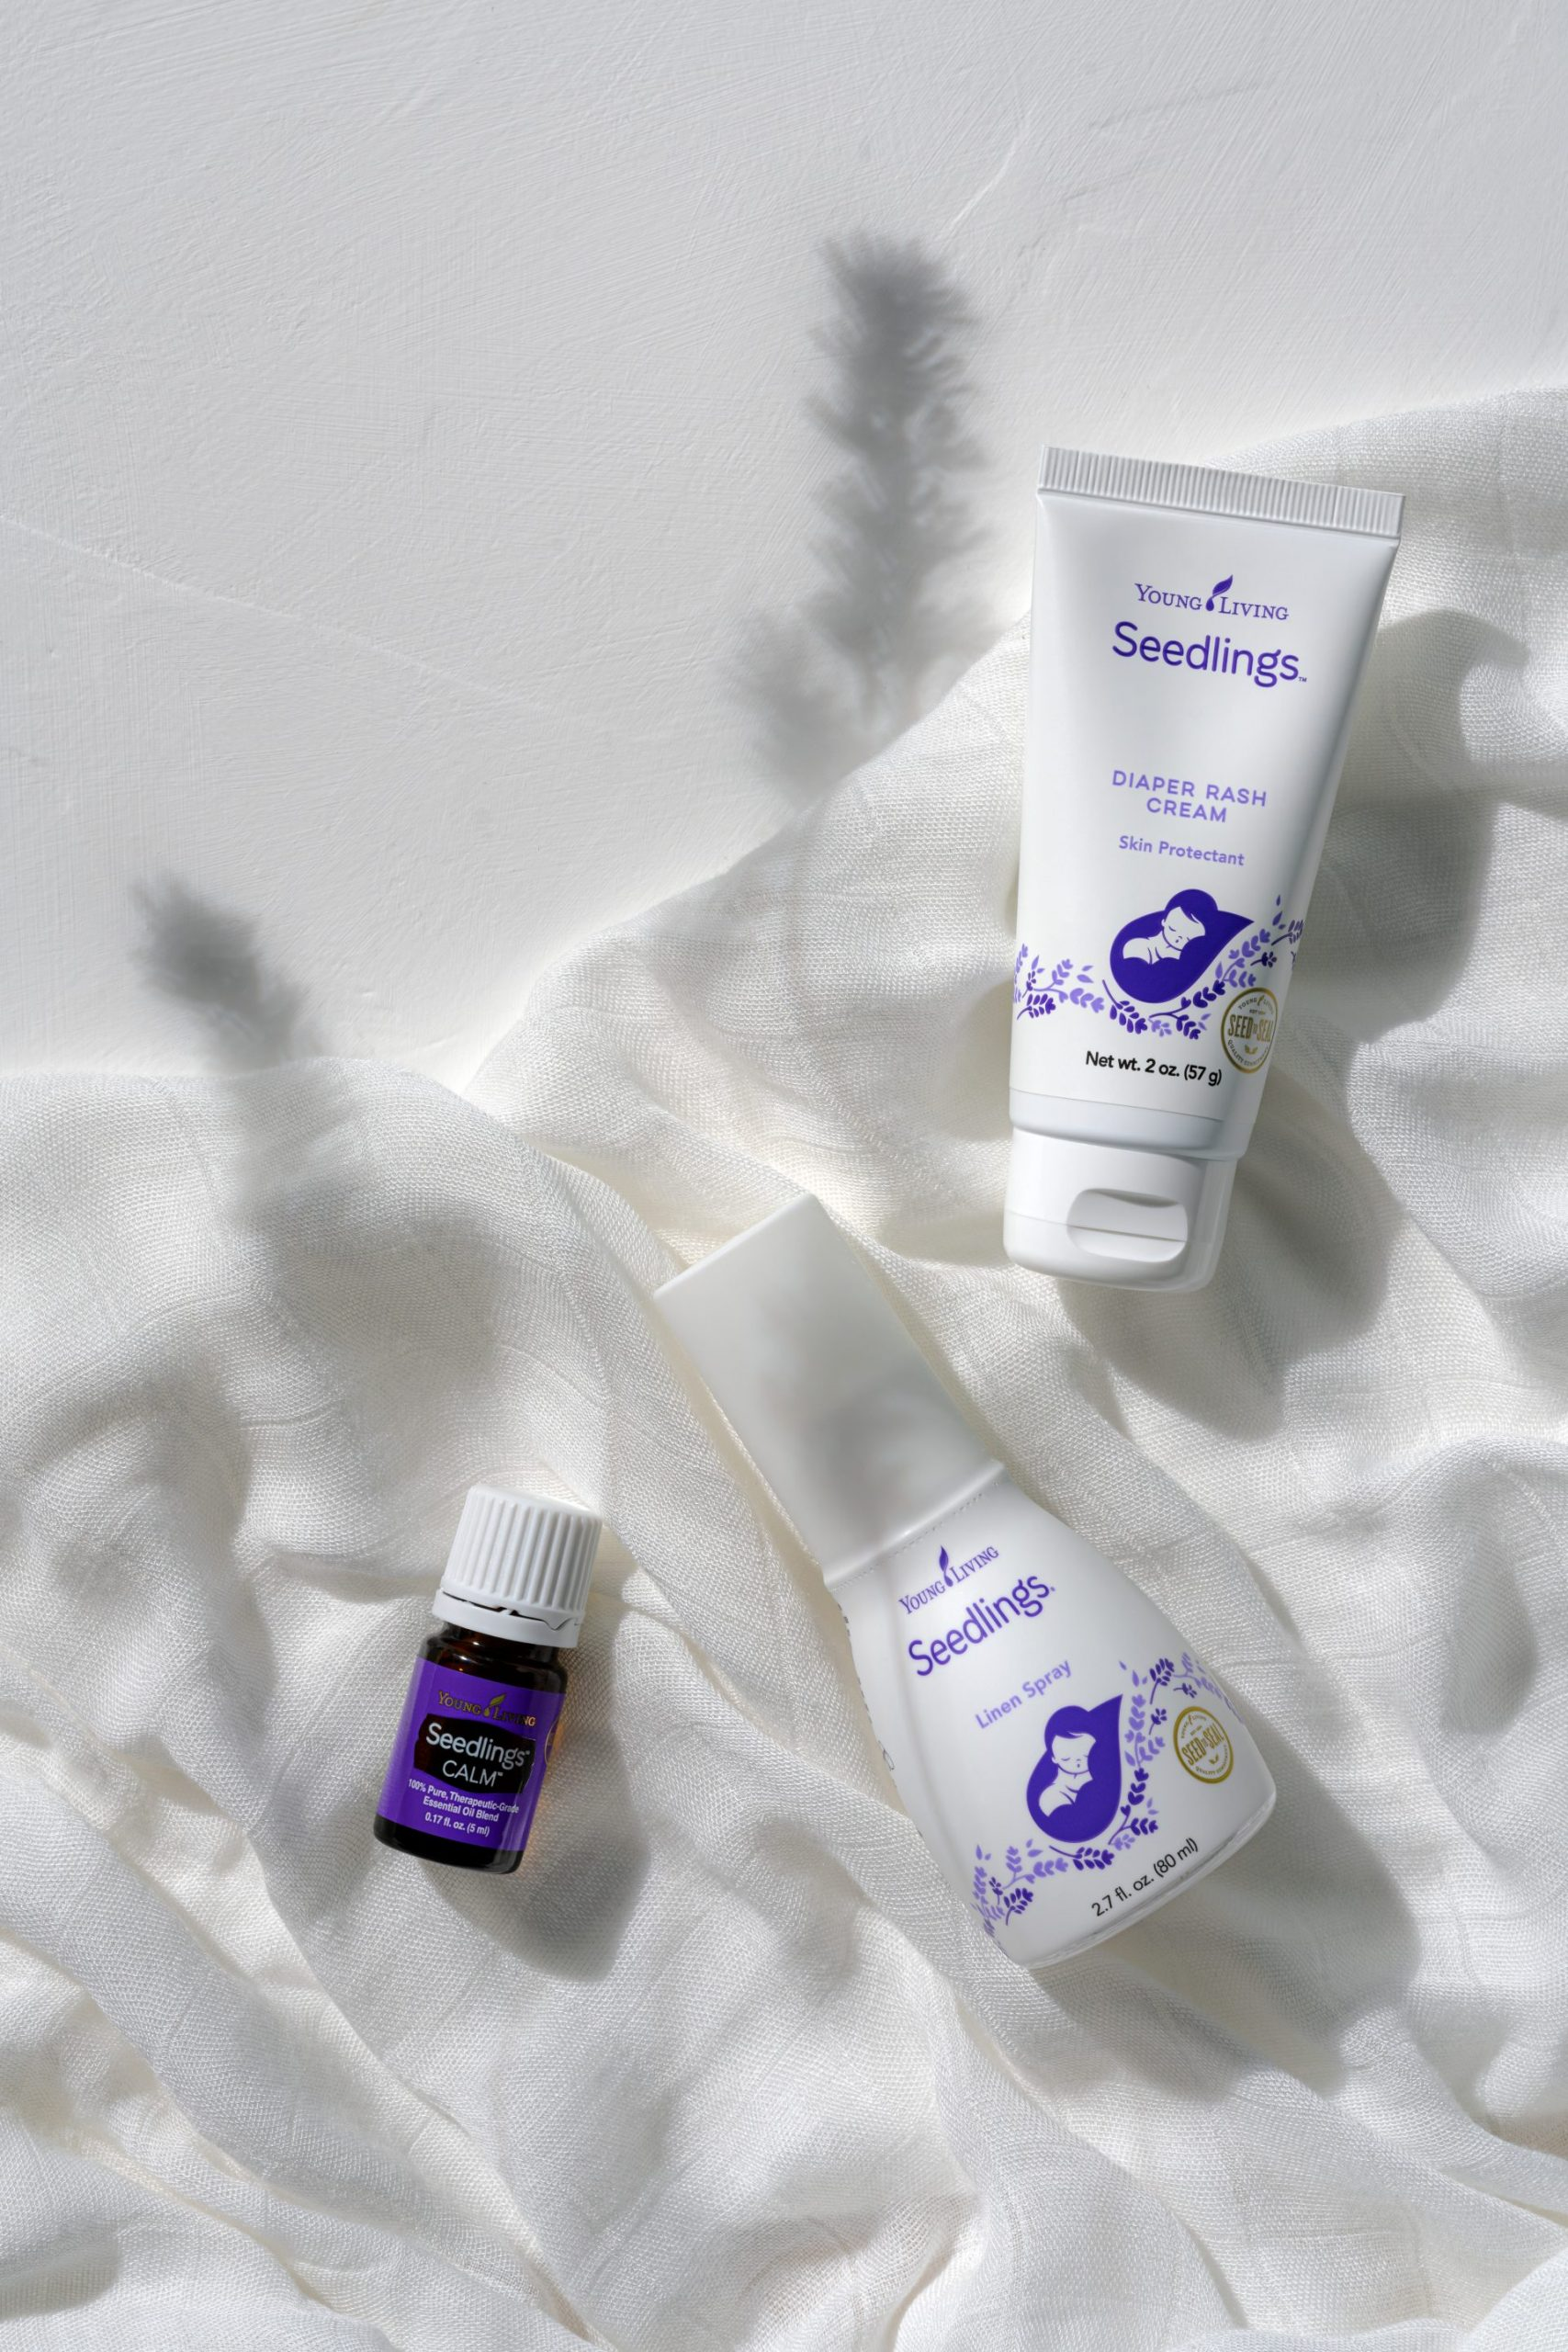 Seedlings Diaper Rash Cream, Seedlings Linen Spray, & Seedlings Calm Essential Oil Blend - Young Living Essential Oils